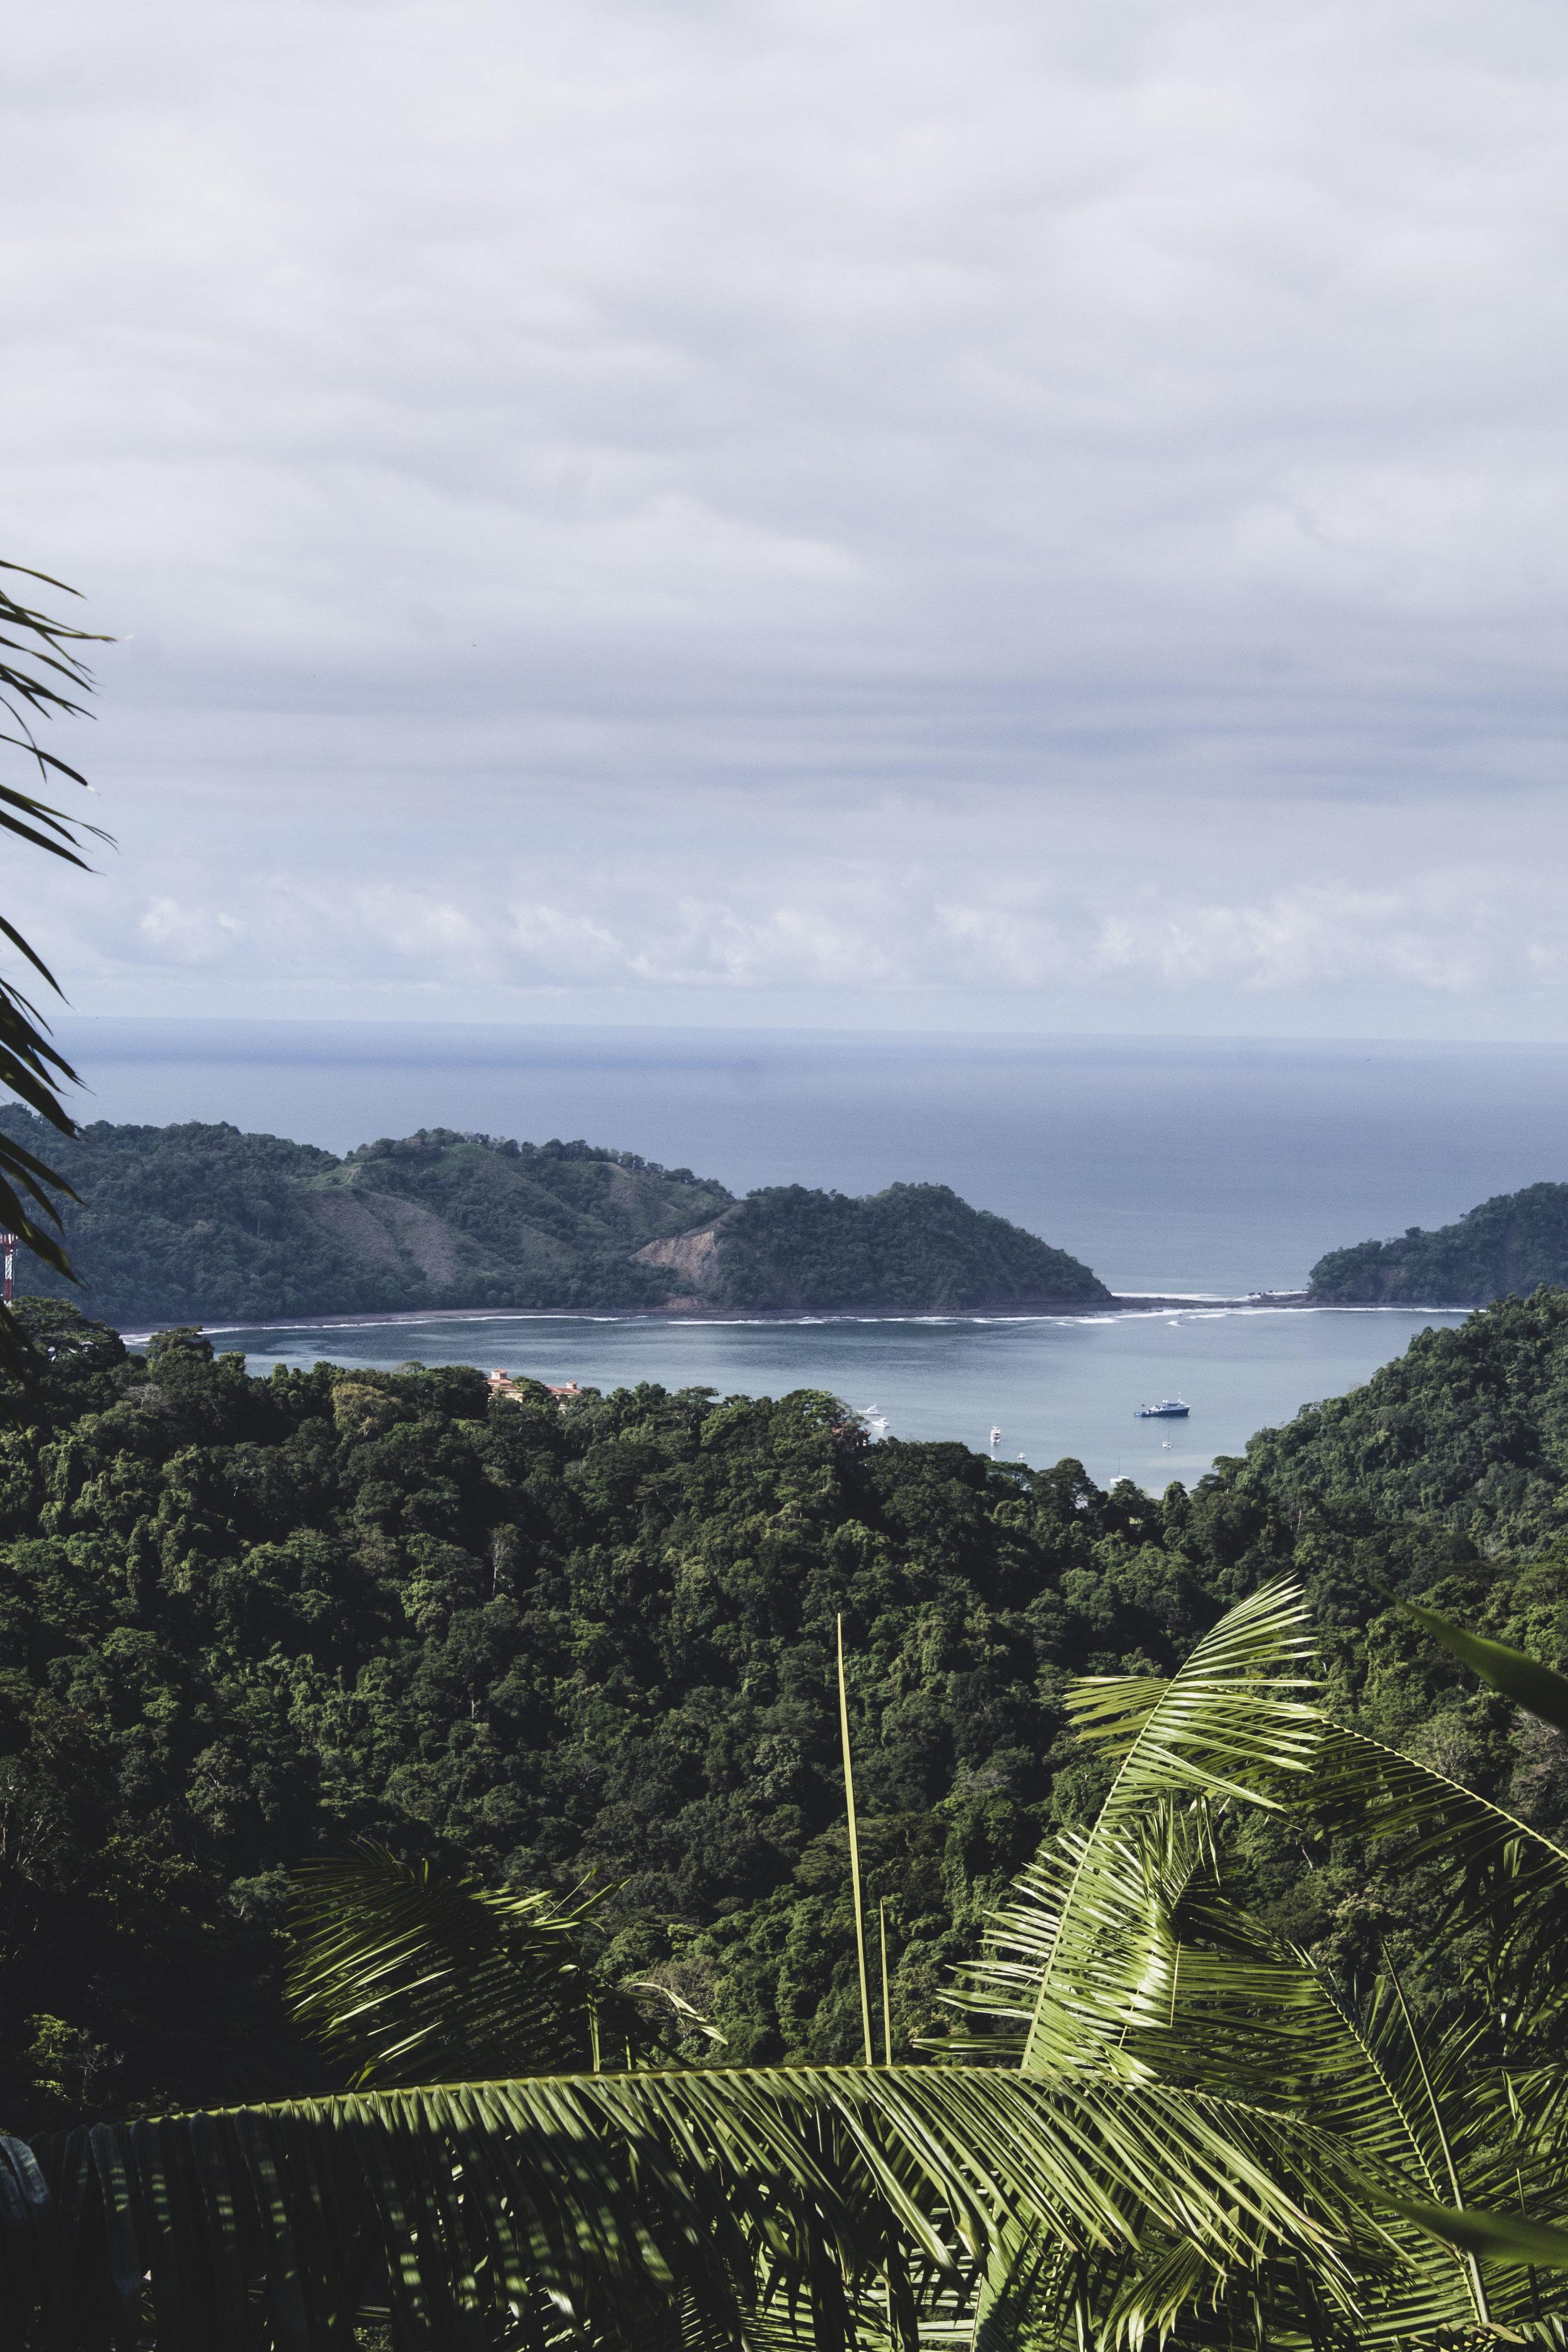 Gorgeous views of Jaco, Costa Rica